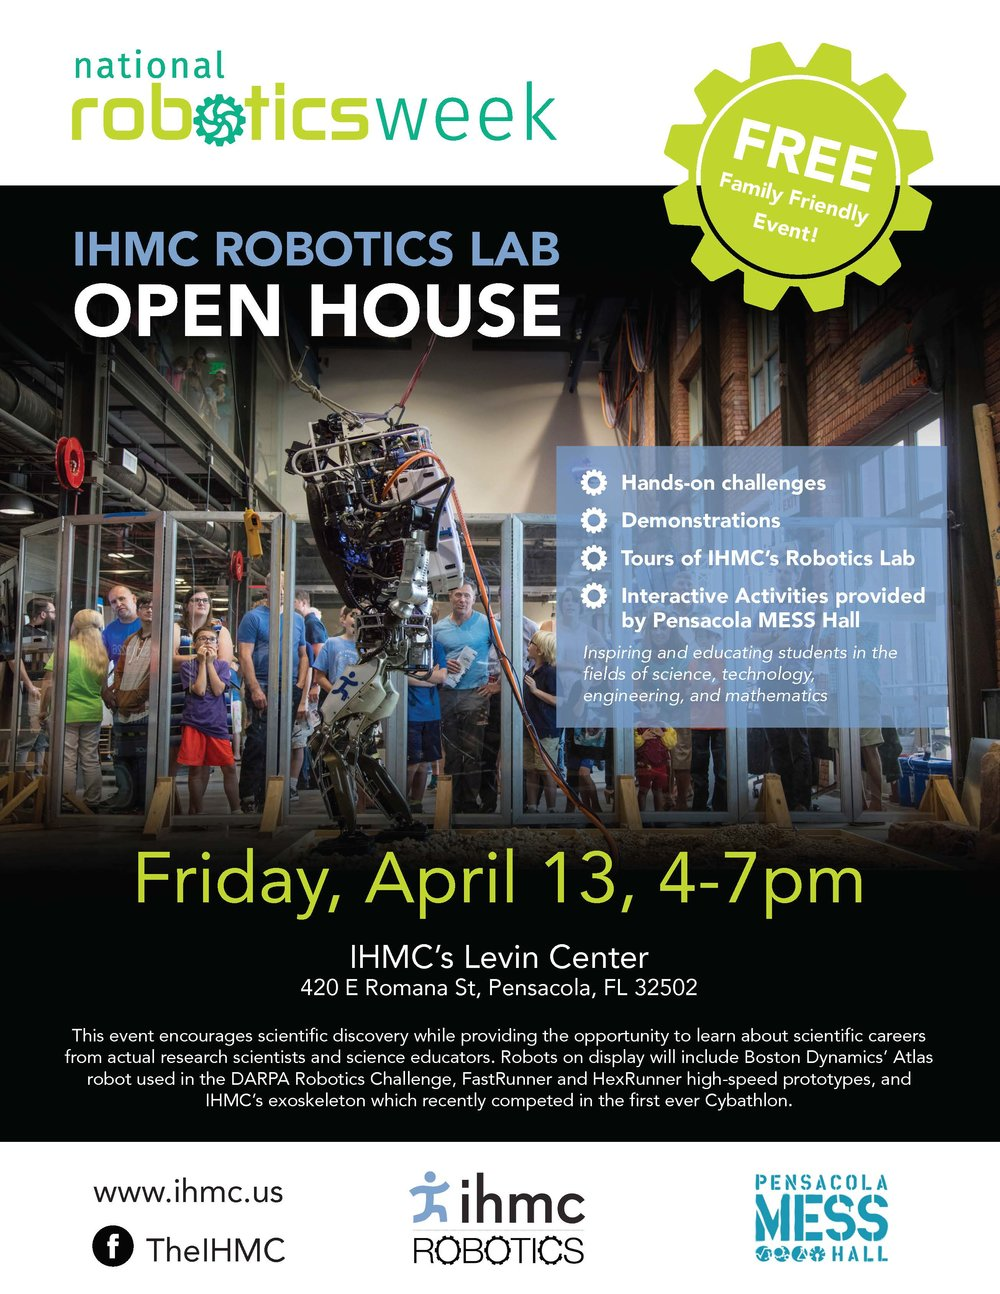 IHMC-robotics-openhouse-2018-v2.jpg